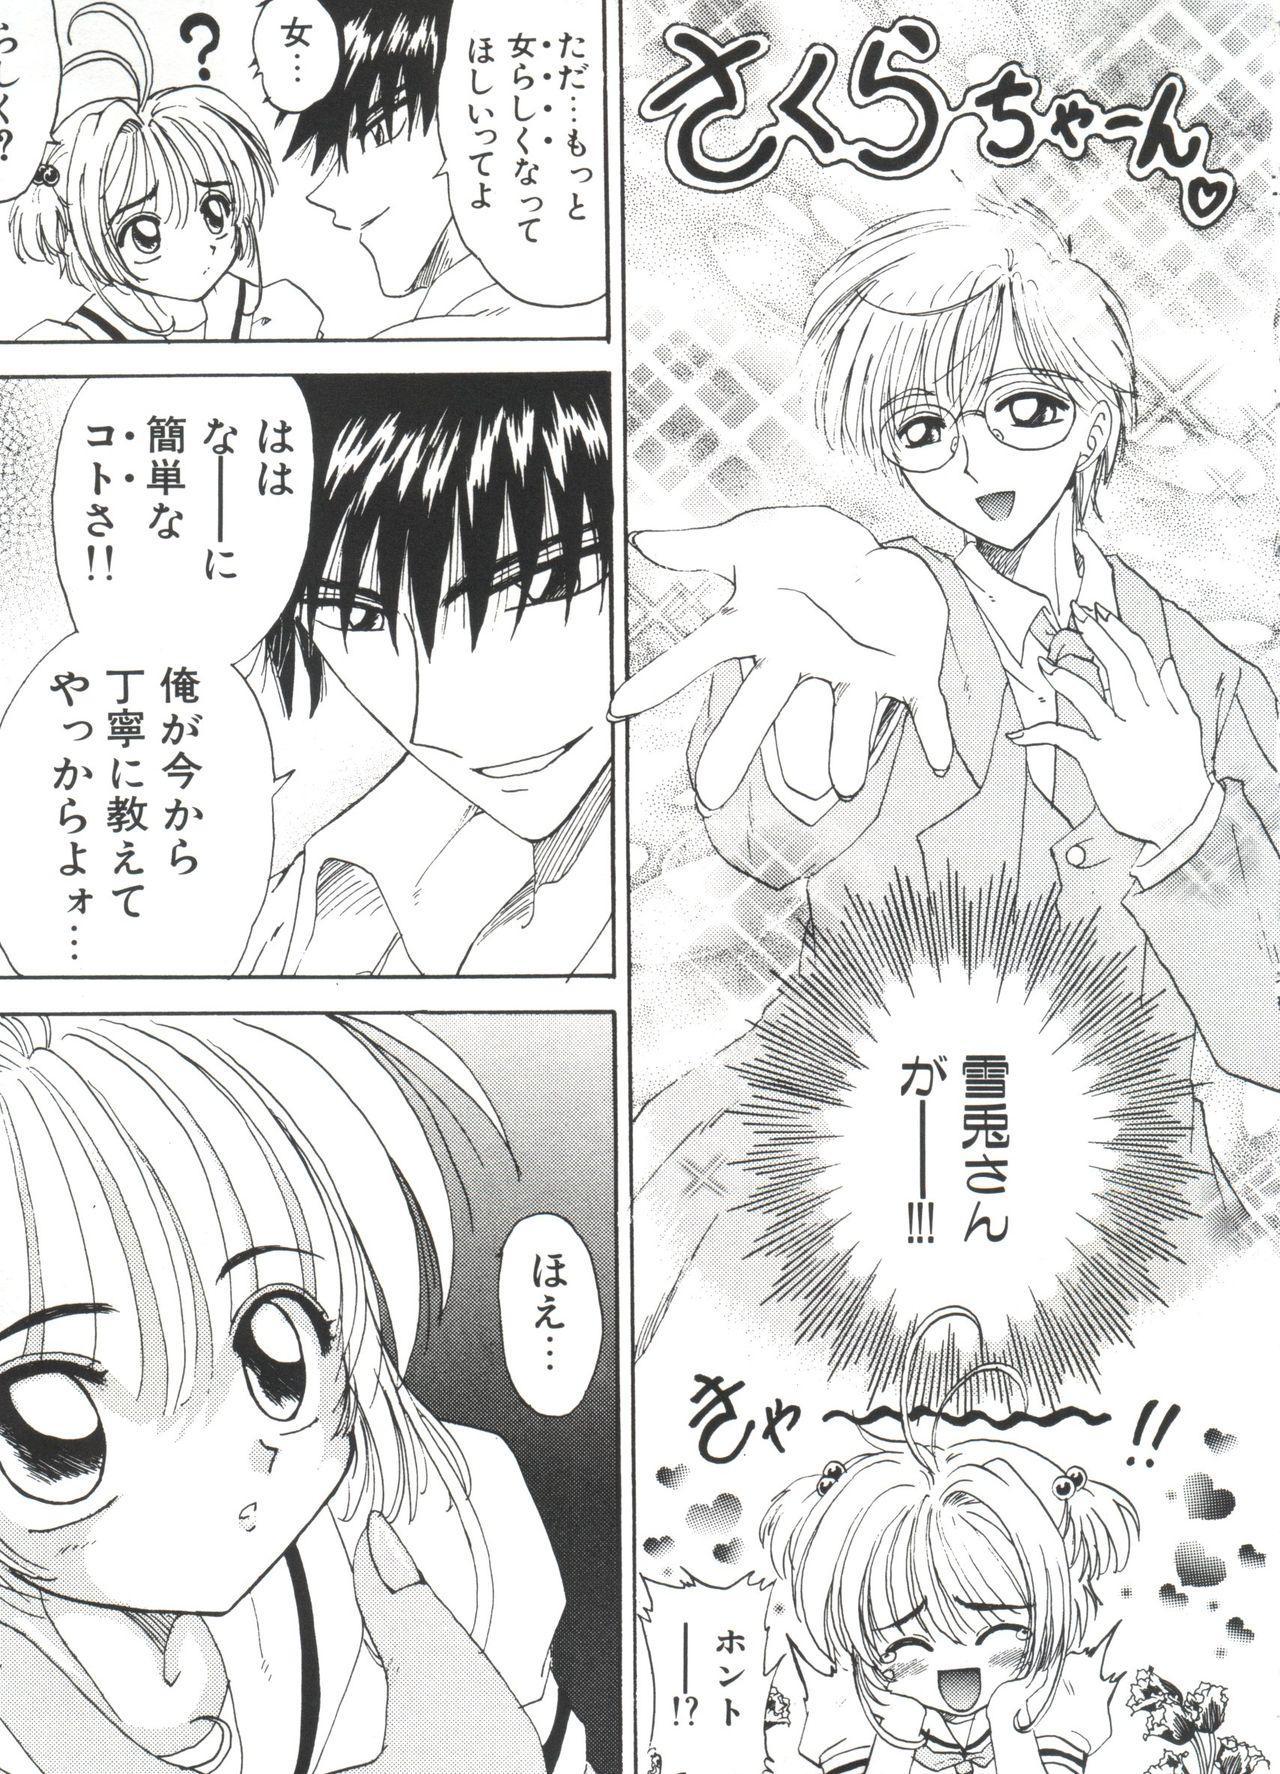 Ero-chan to Issho 2 106